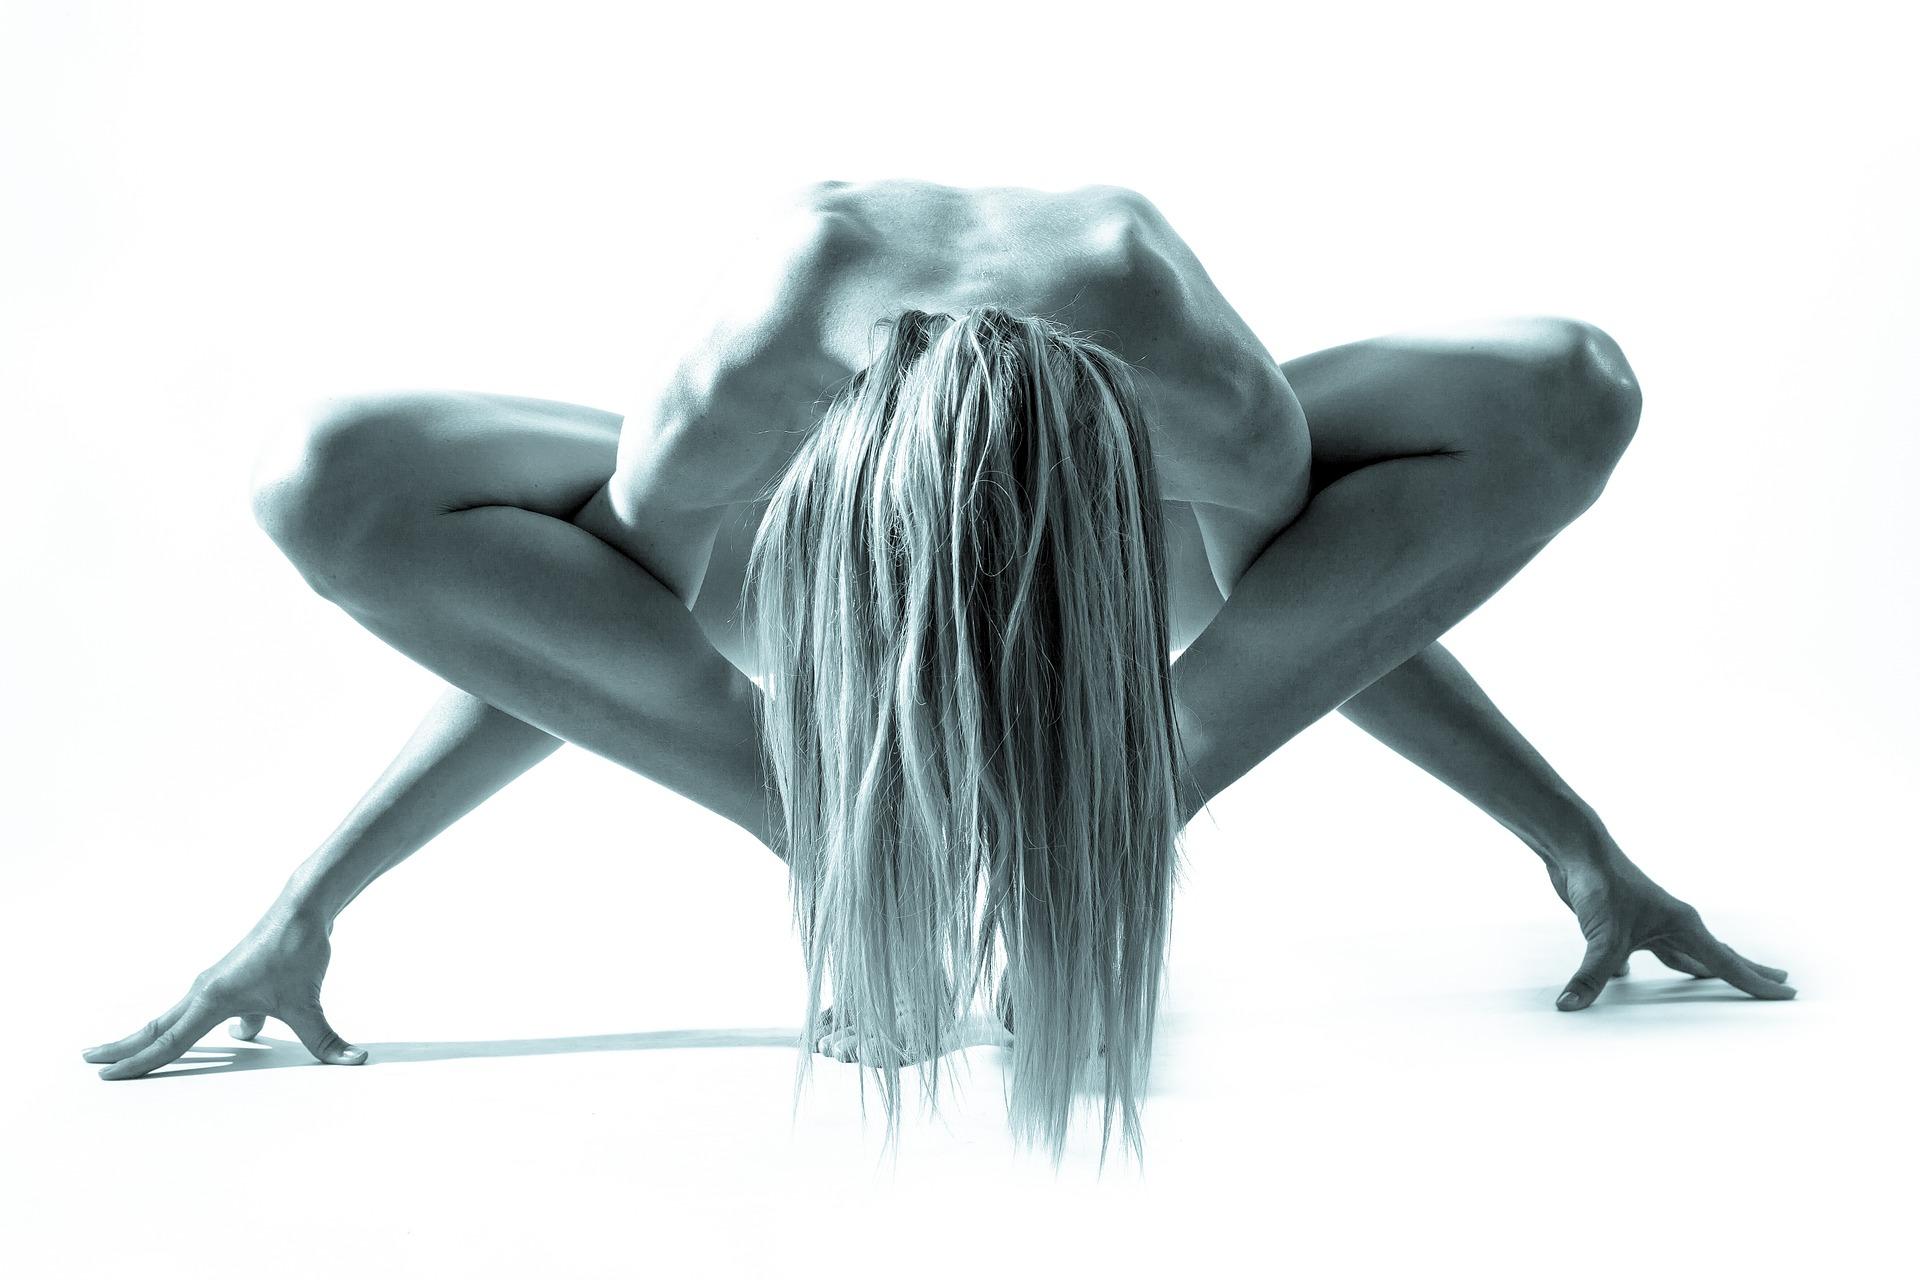 Nackte Frauen im Yoga